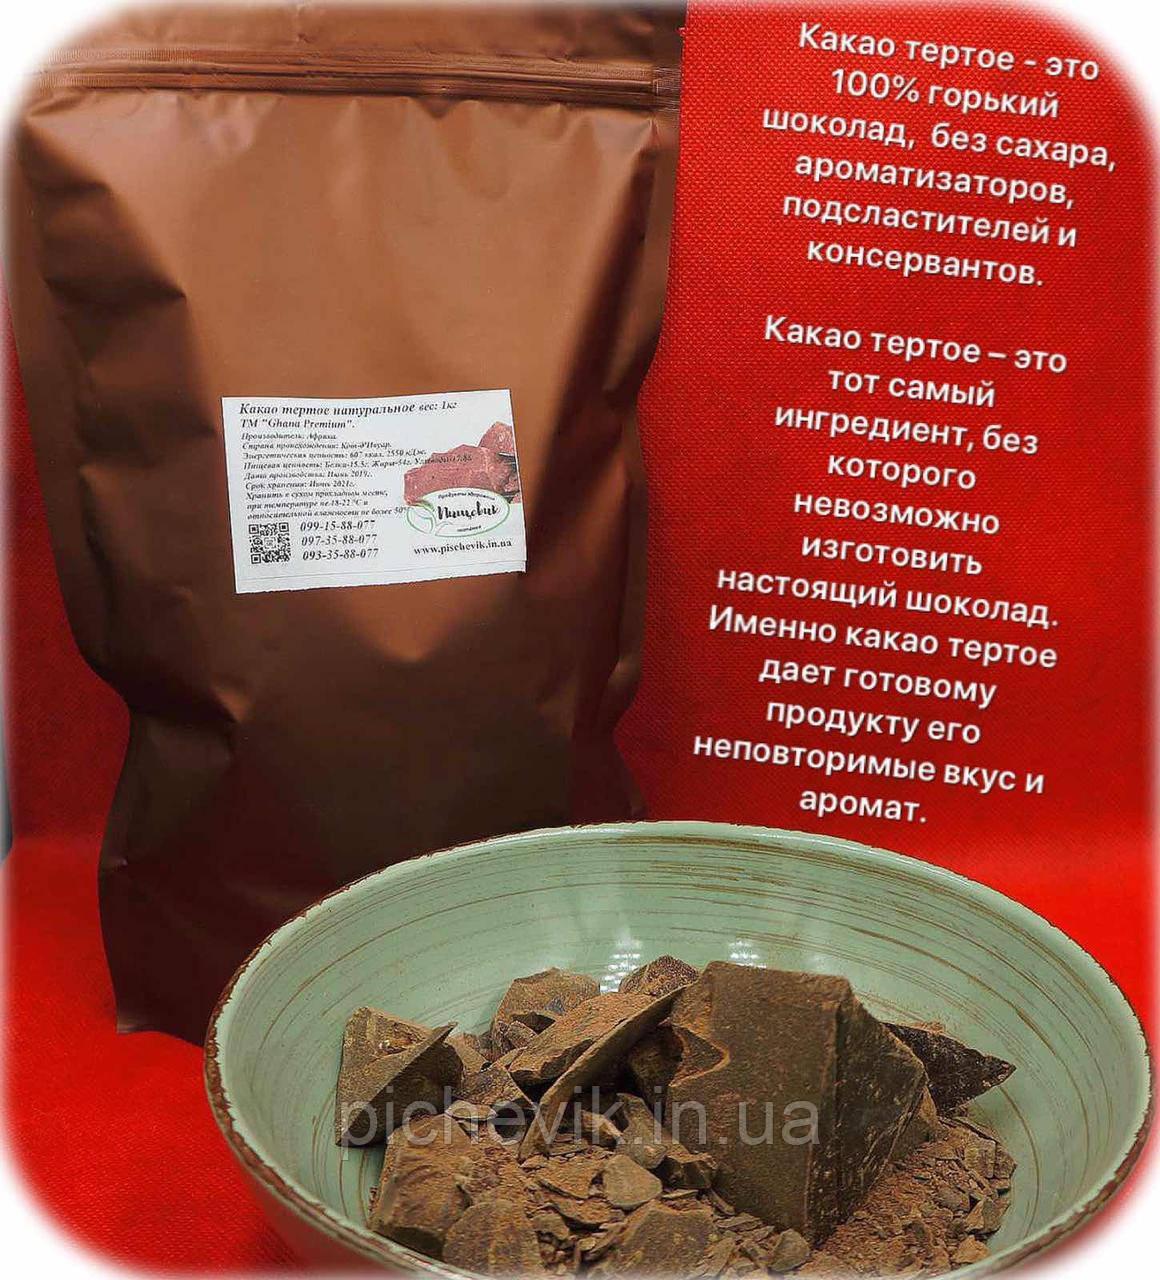 Терте какао натуральне (моноліт), Ghana Premium (Африка, Ghana) вага: 1 кг